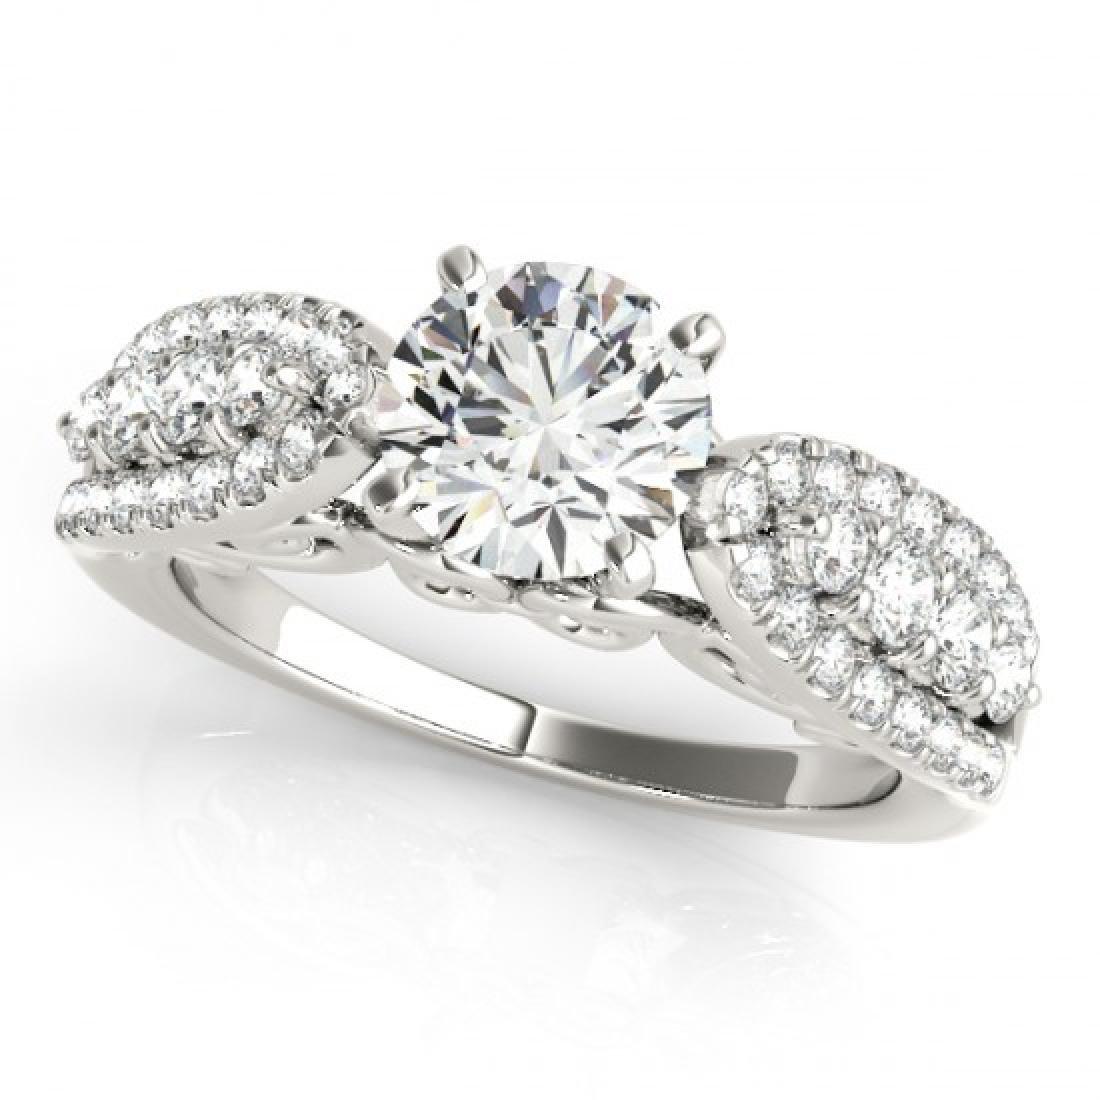 2 CTW Certified VS/SI Diamond Solitaire Ring 14K White